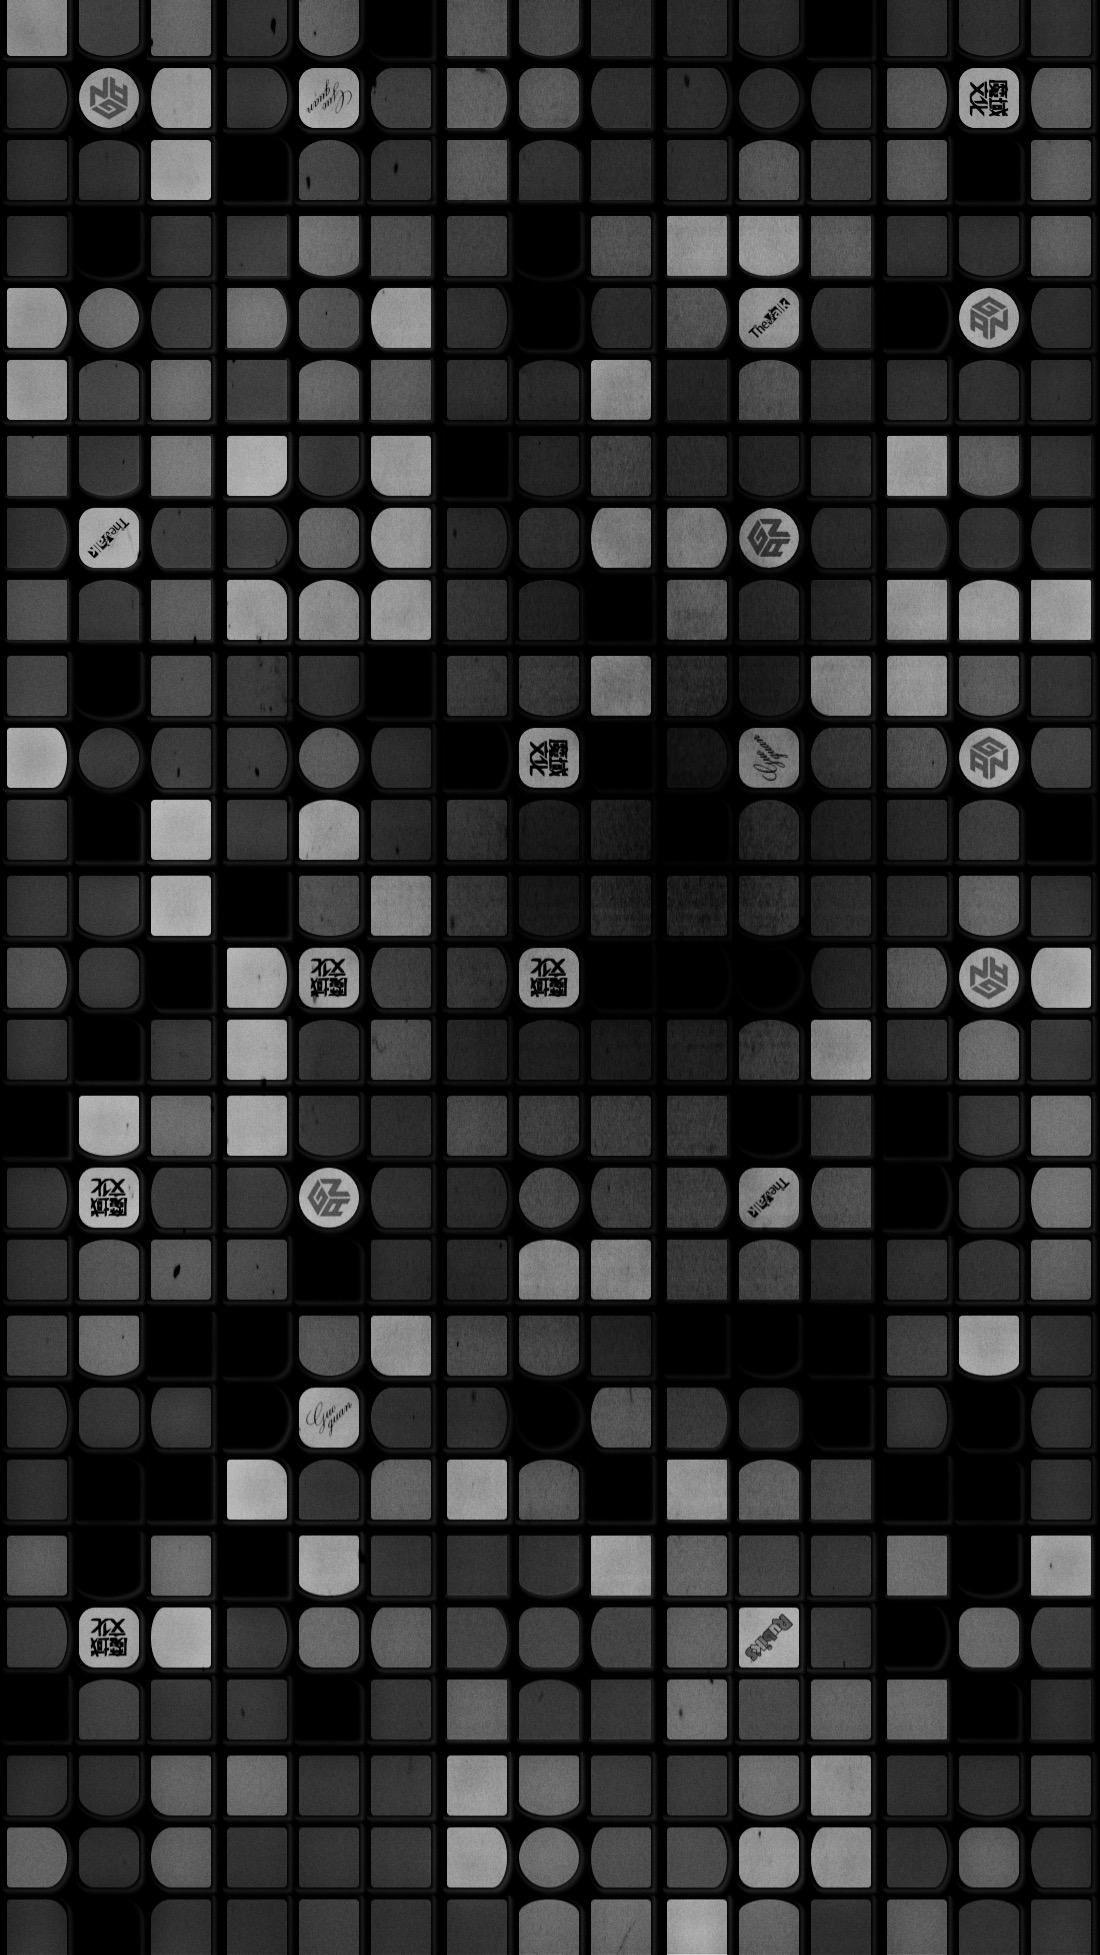 Magic Cube Rubik Puzzle Phone Mobile Wallpaper [1080 x 1920